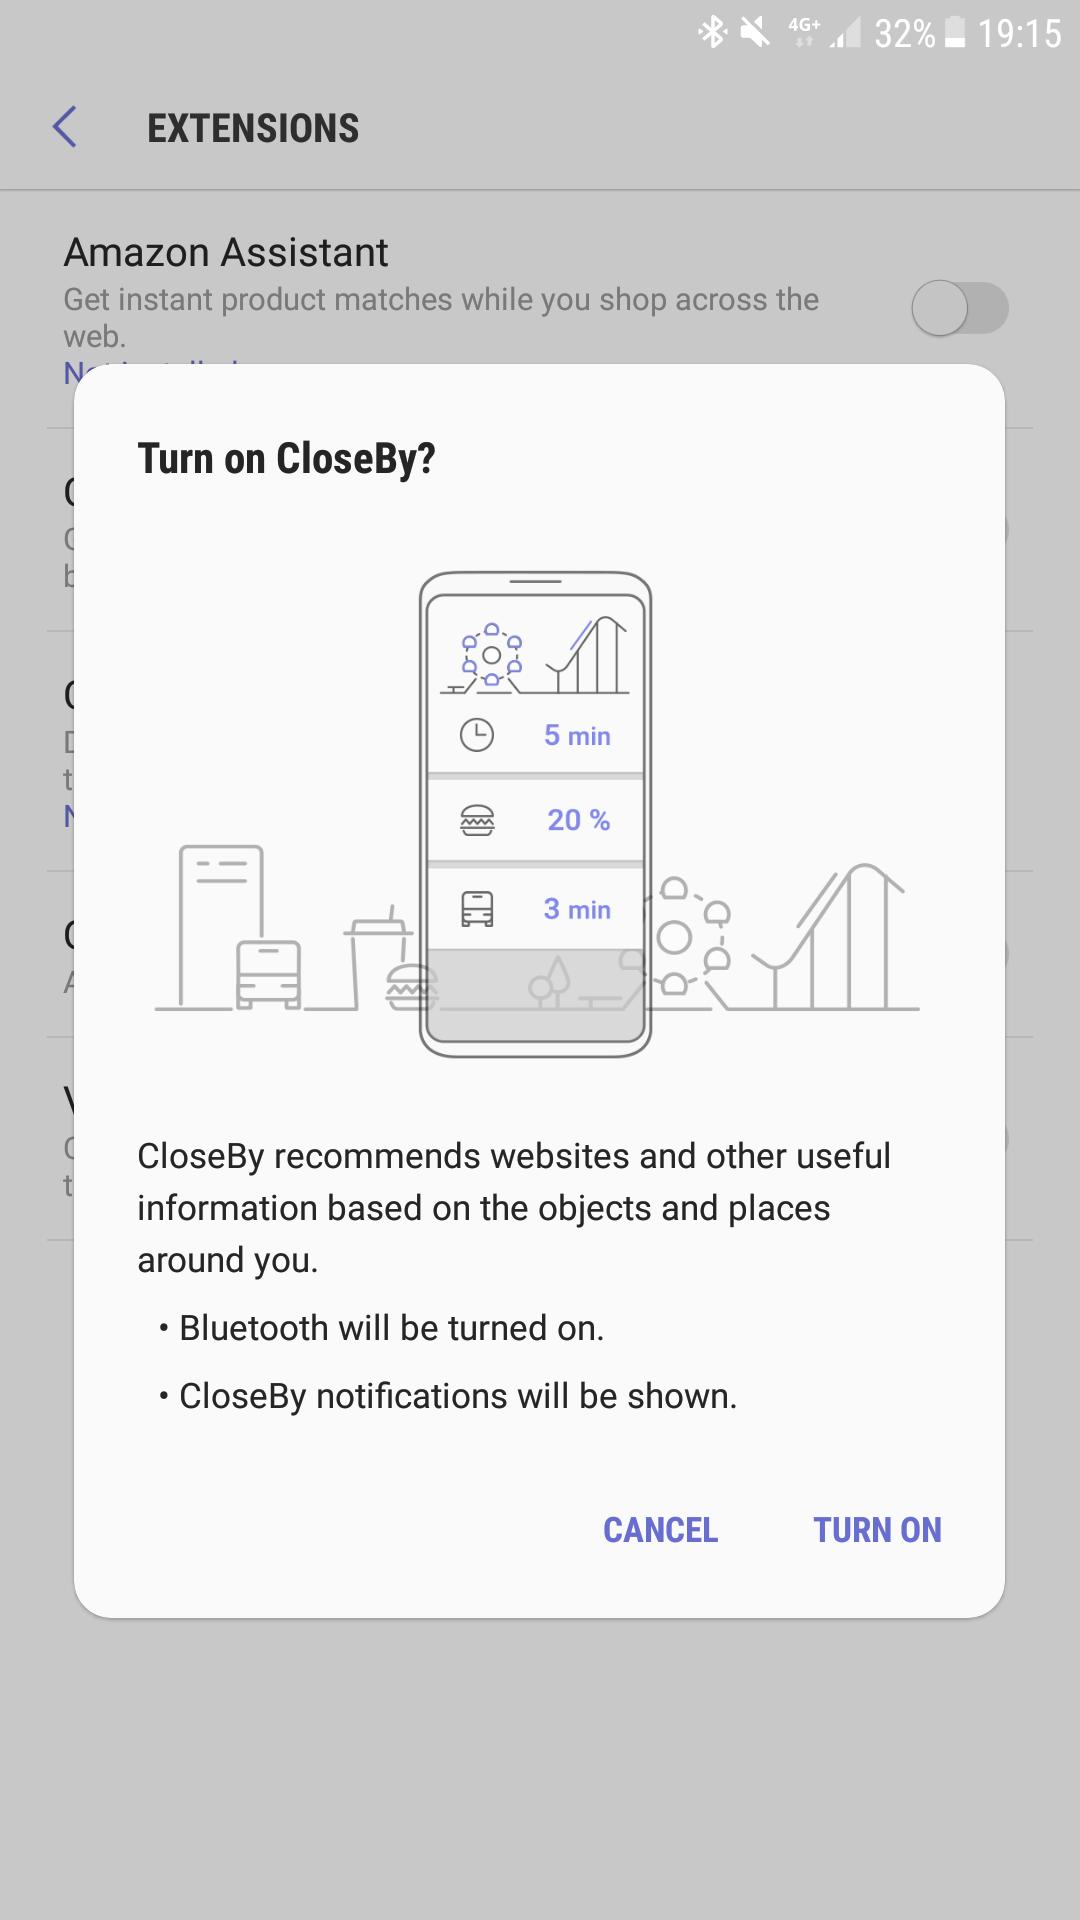 Samsung Internet Beta application highlights design of the